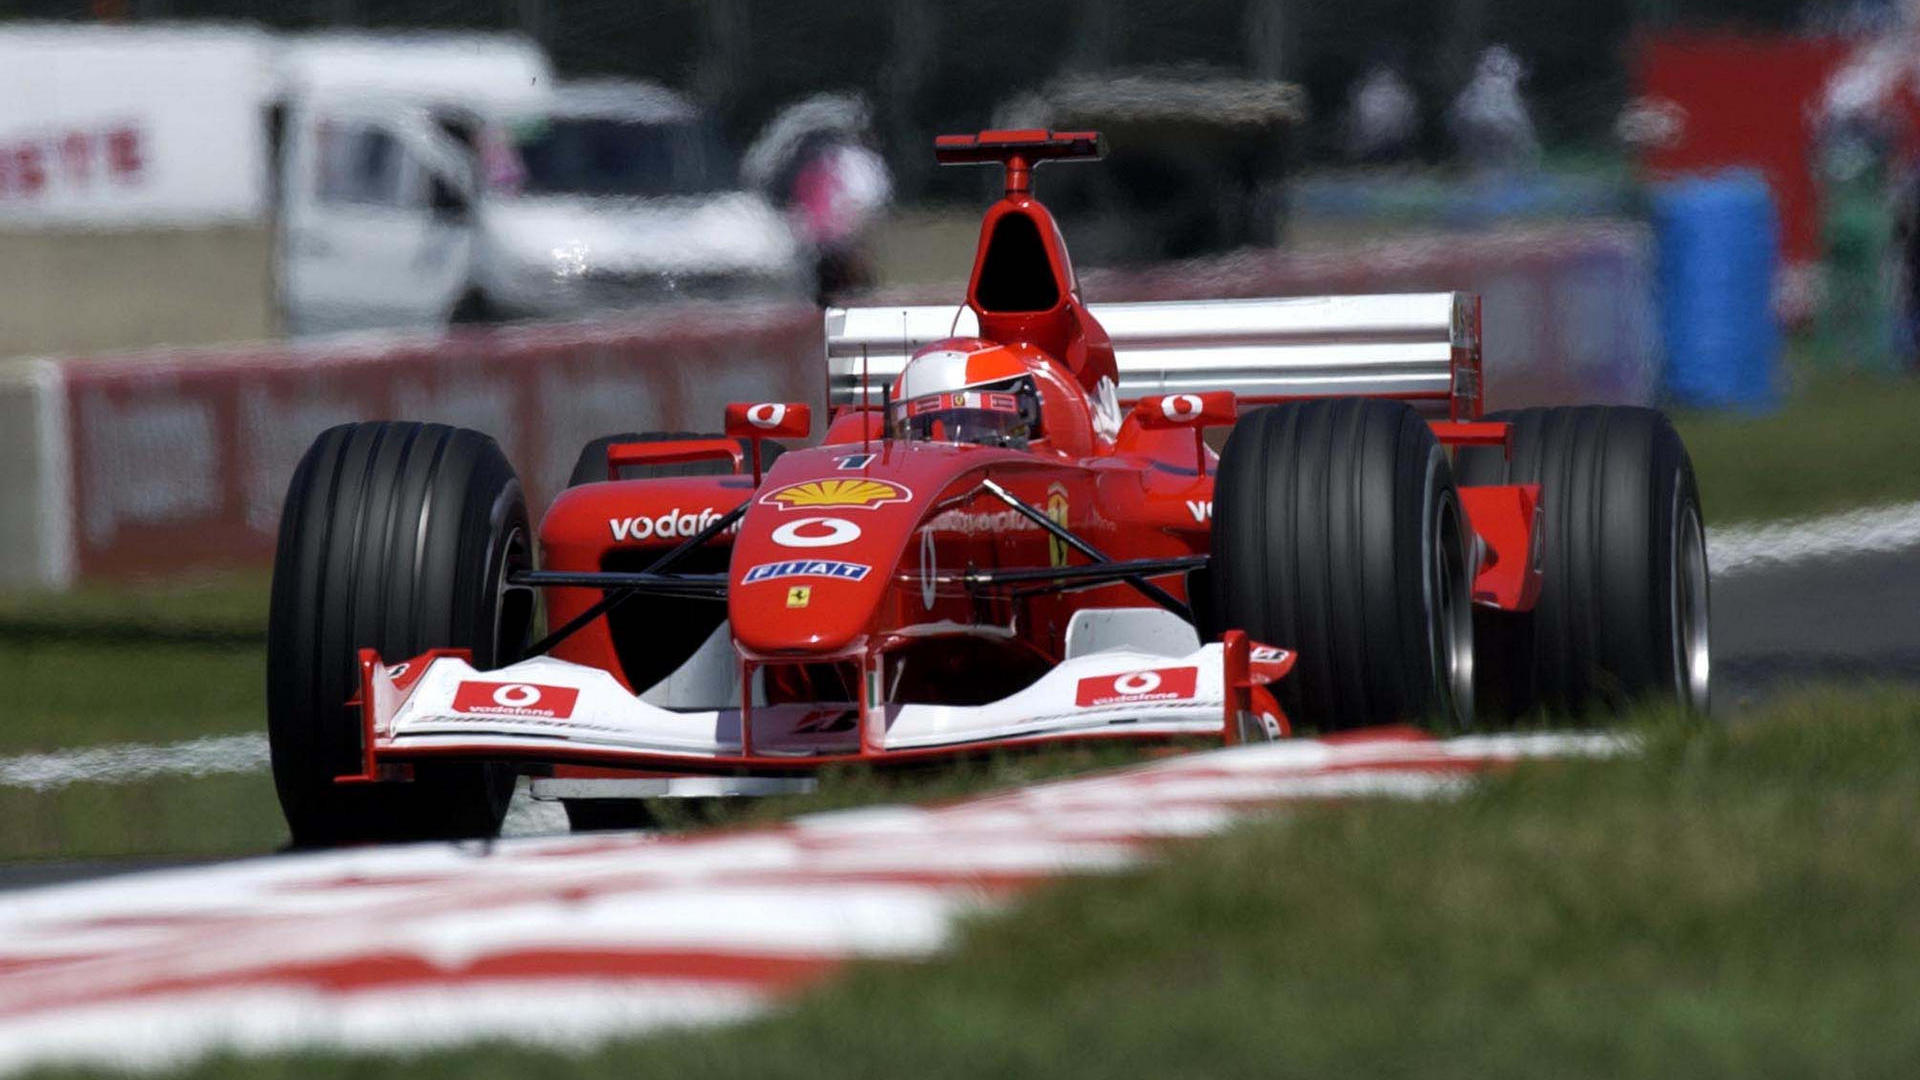 Hd Wallpapers 2002 Formula 1 Grand Prix Of France